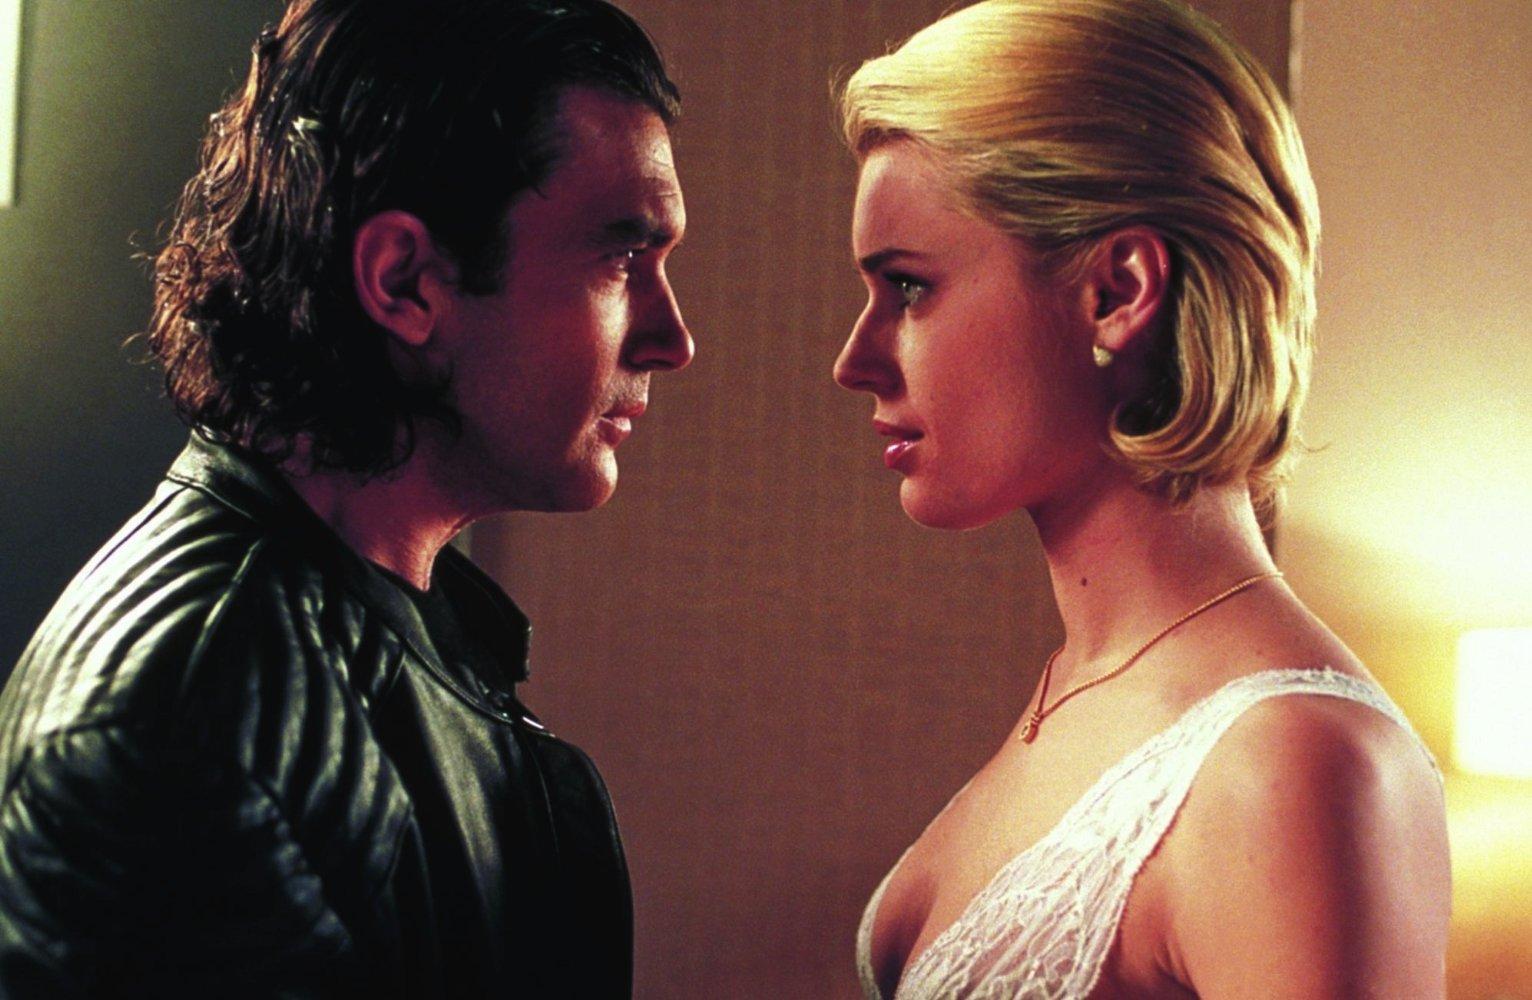 Antonio Banderas investigates the mysterious Rebecca Romijn-Stamos in Femme Fatale (2002)